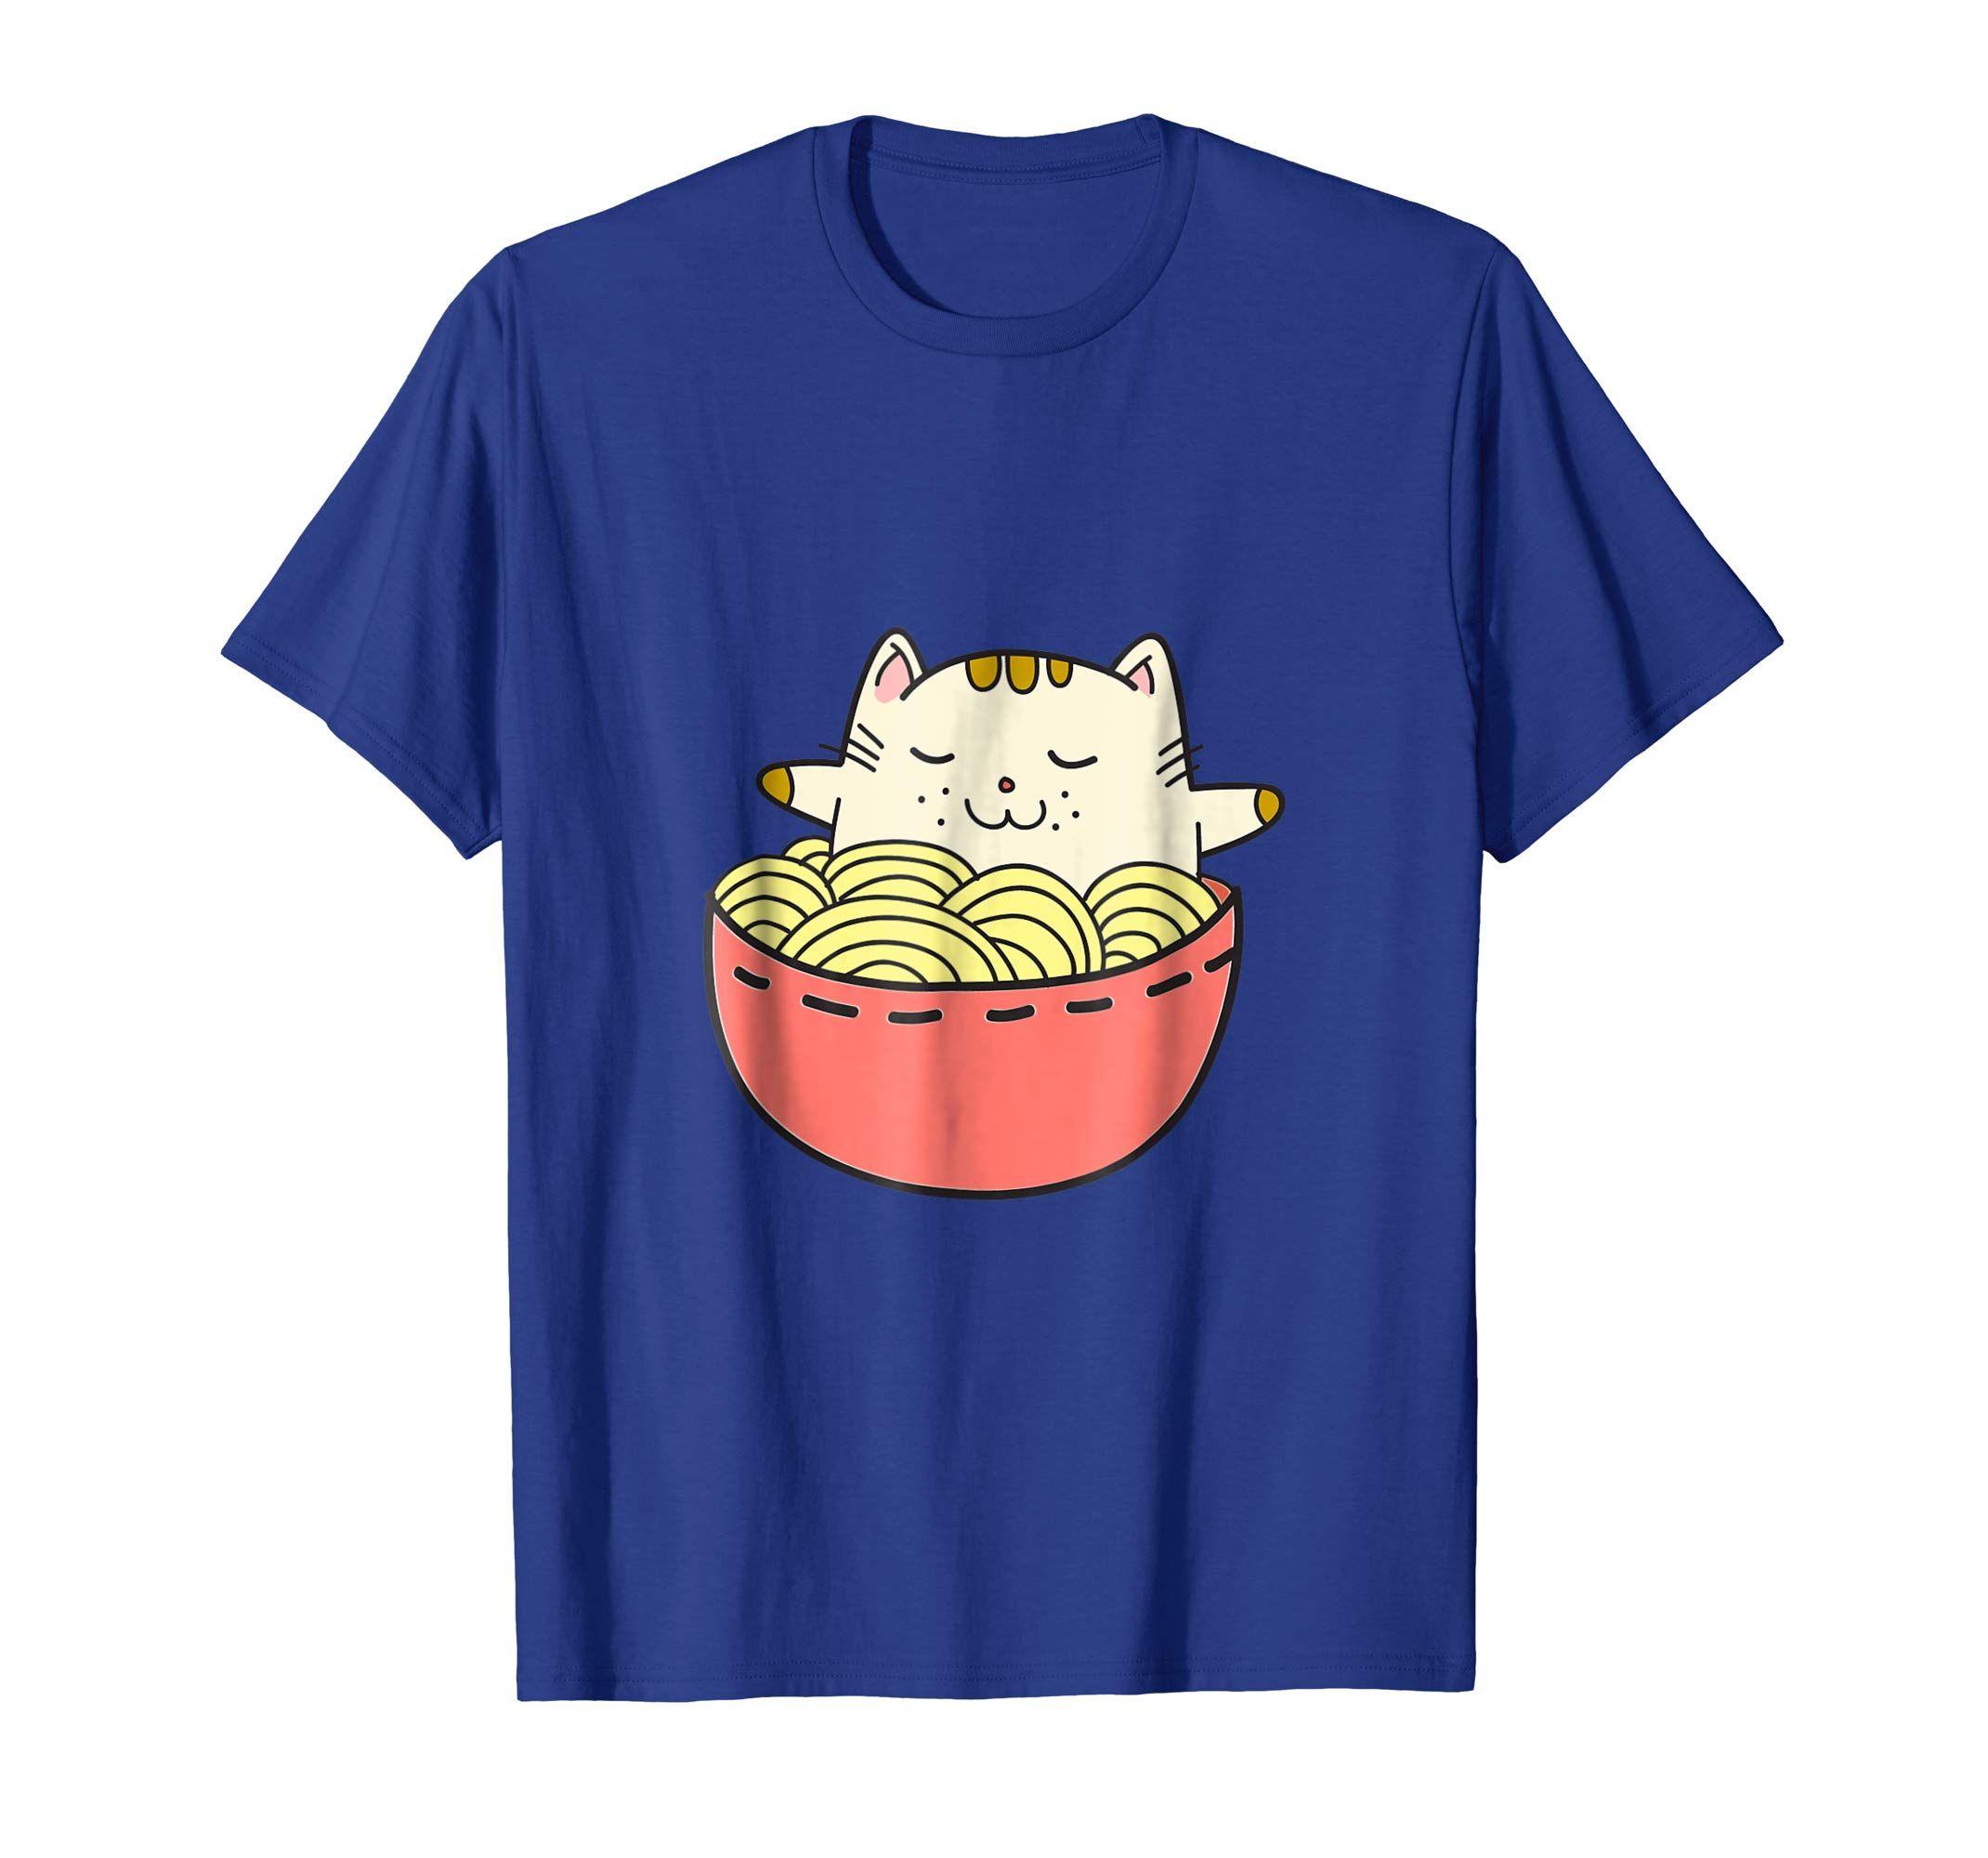 Adorable Kawaii Japanese anime cat in a ramen